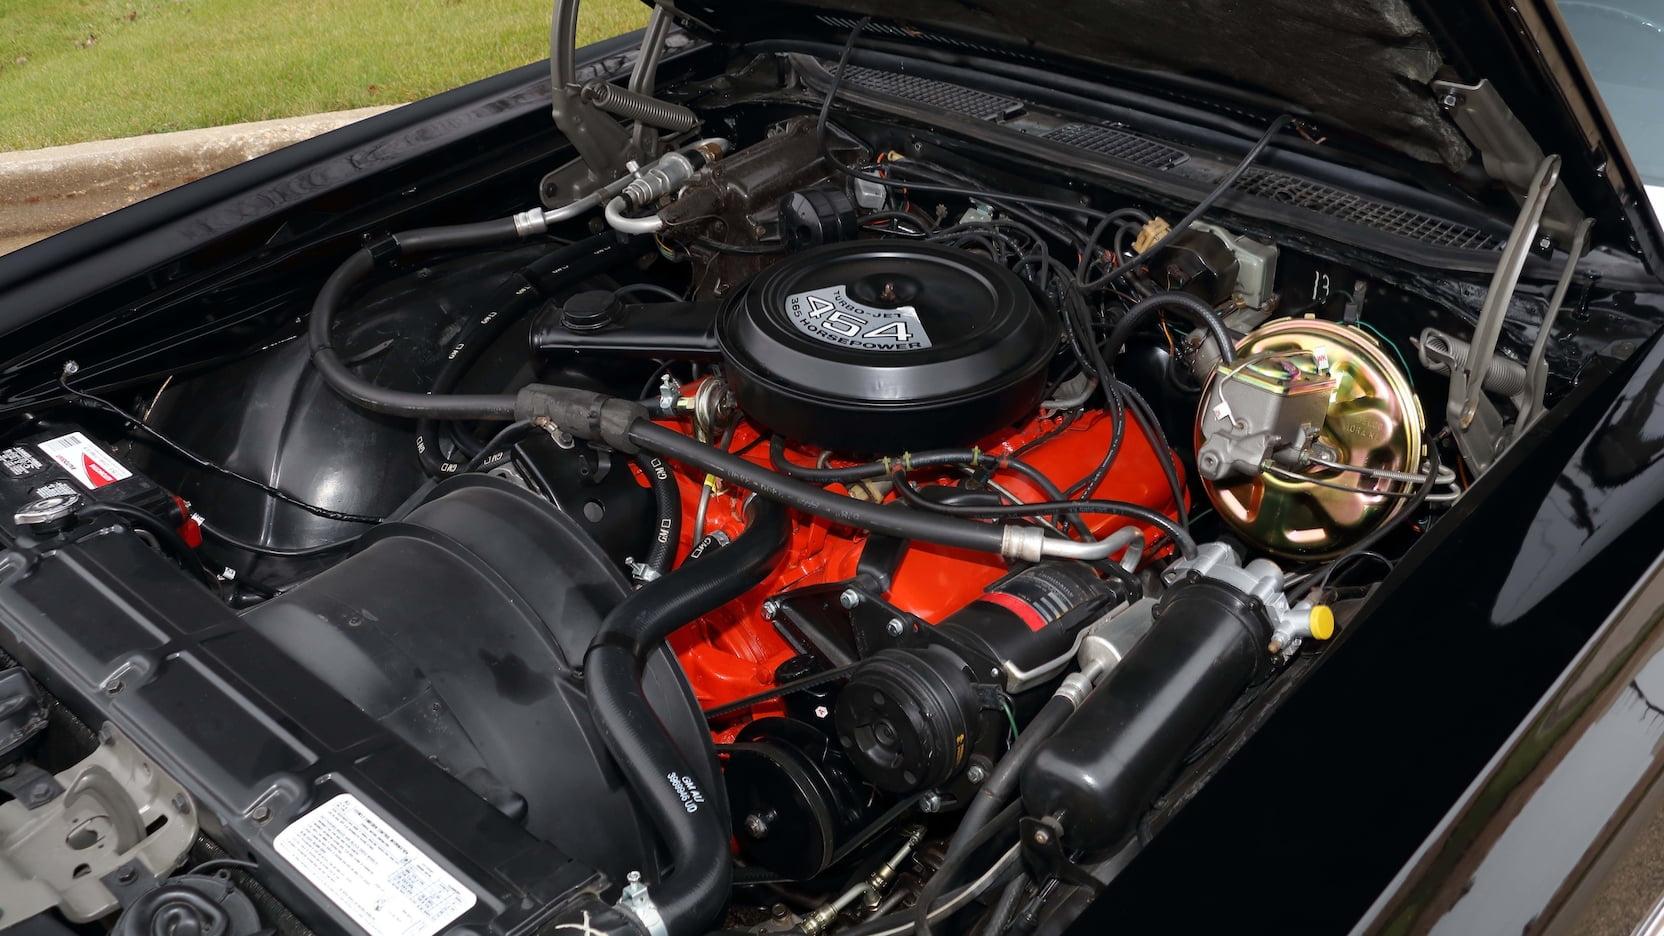 1971 Monte Carlo SS 454 engine